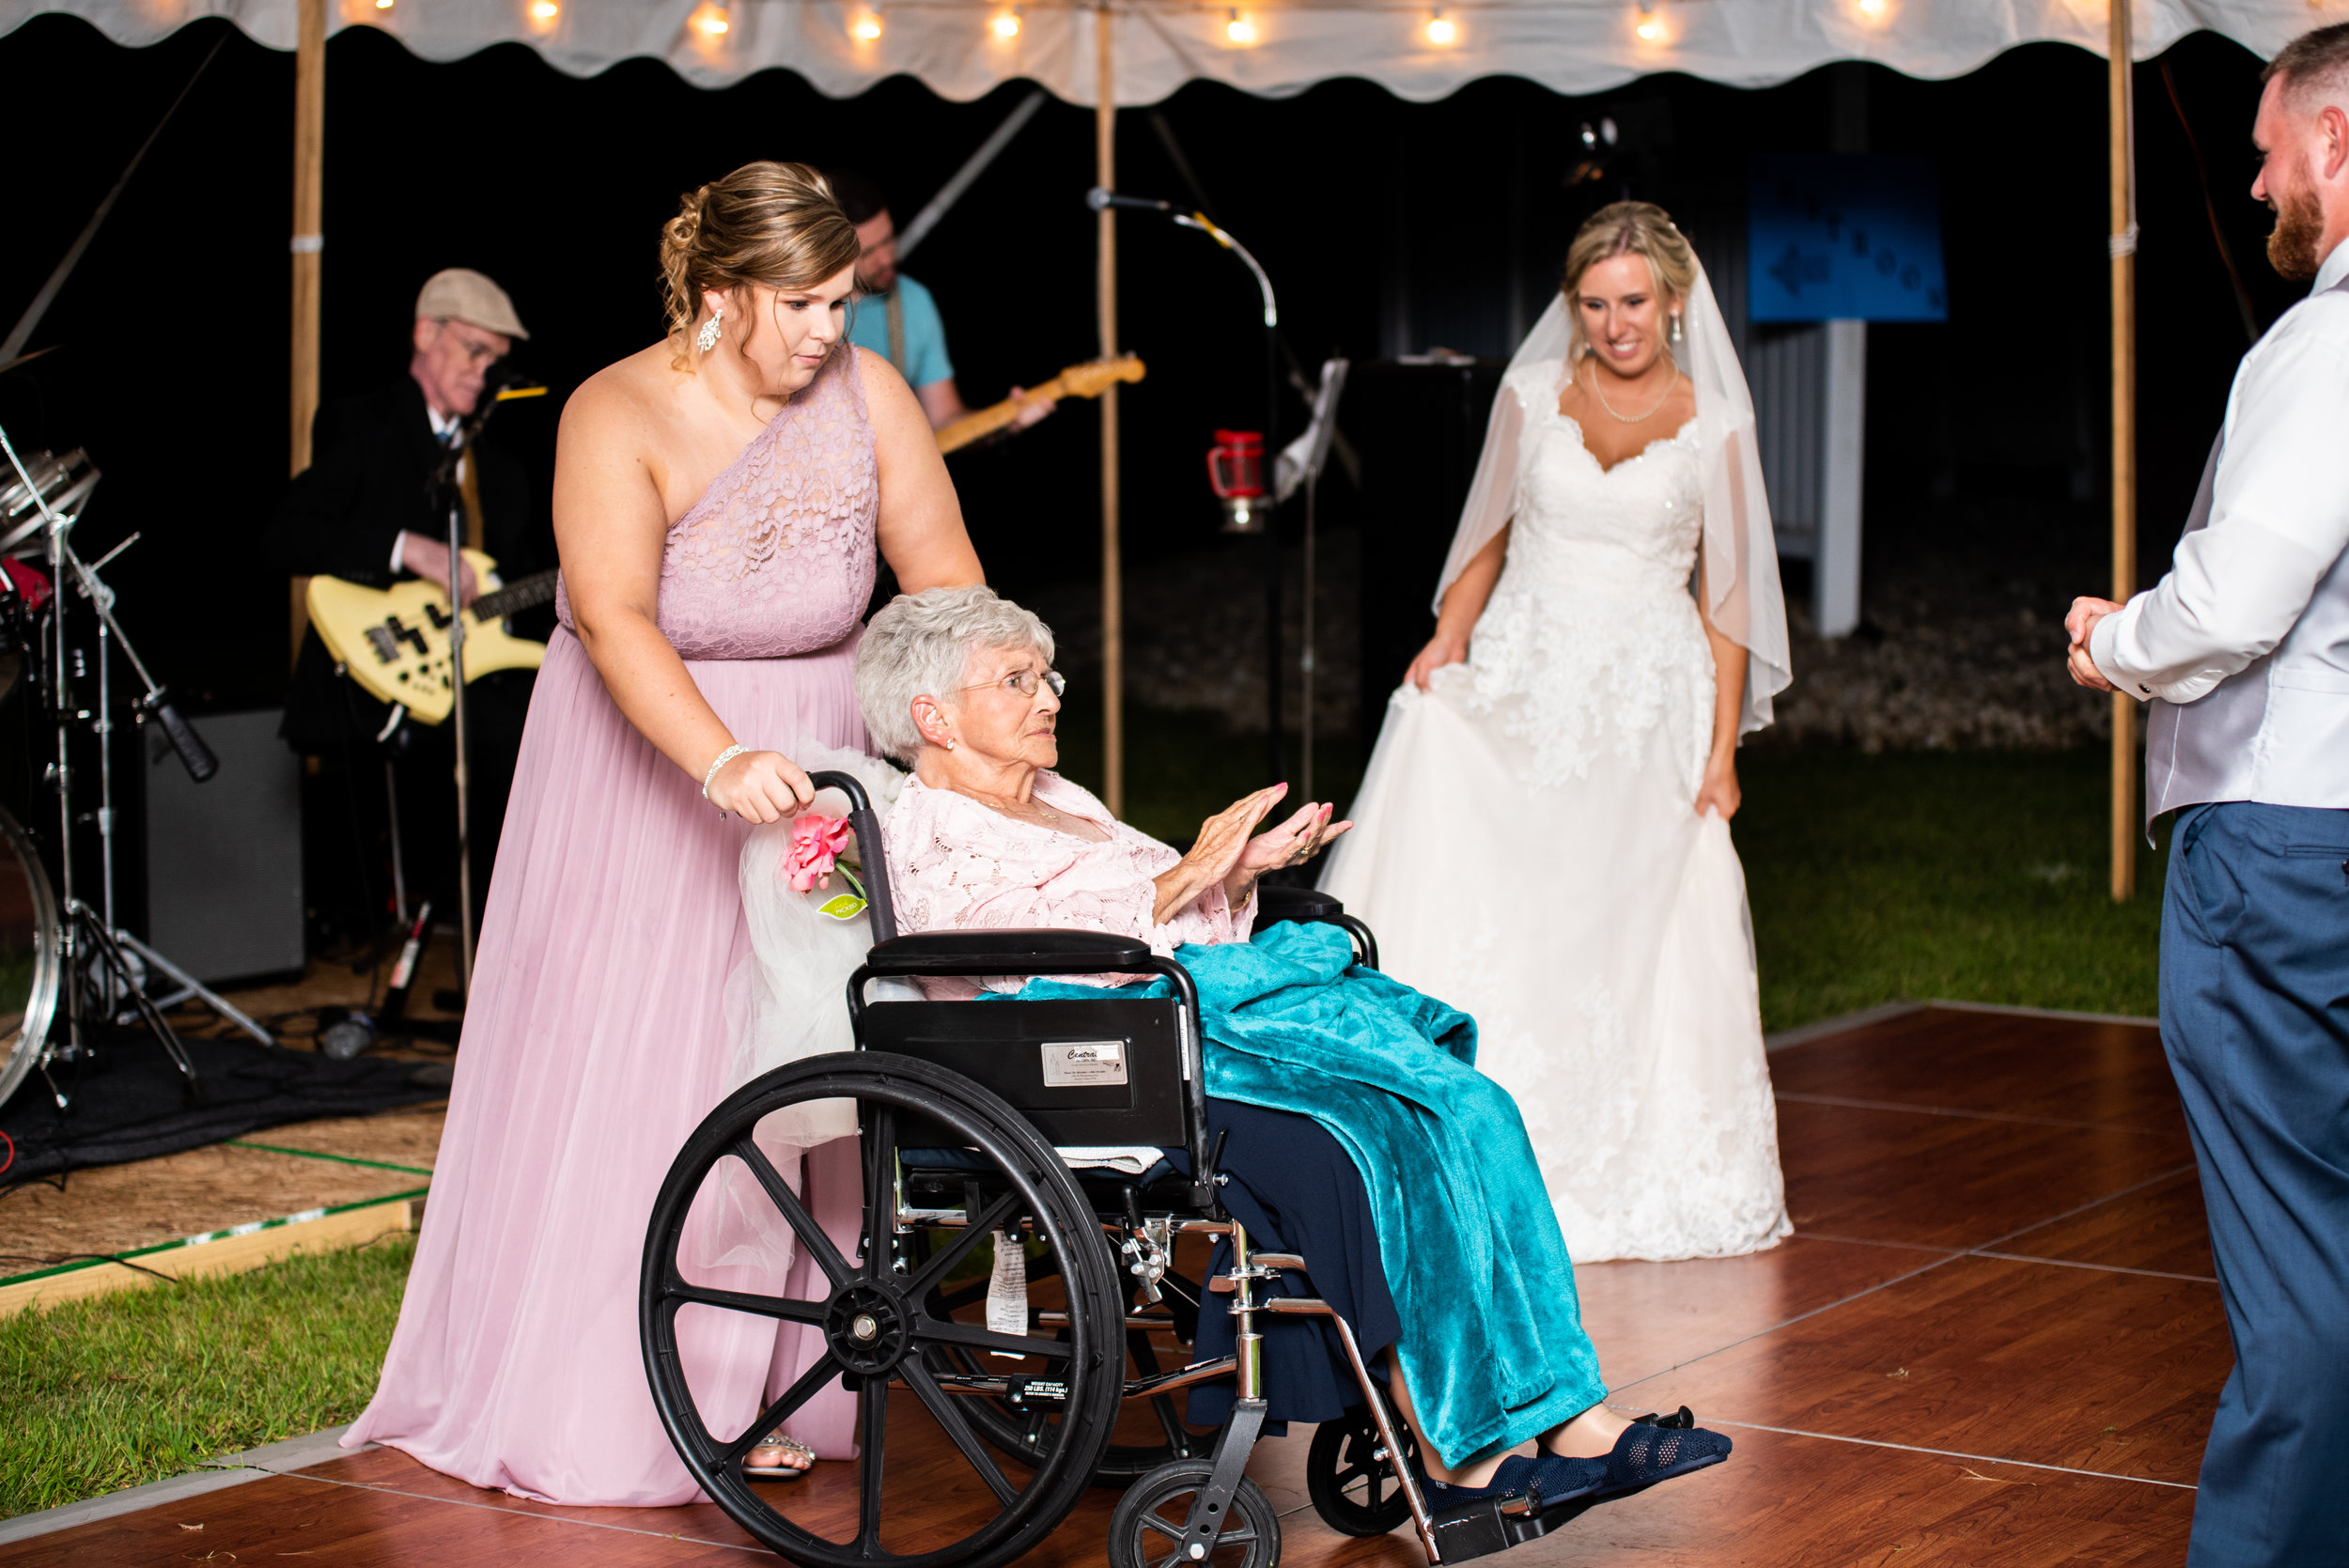 wedding (1 of 1)-225.jpg